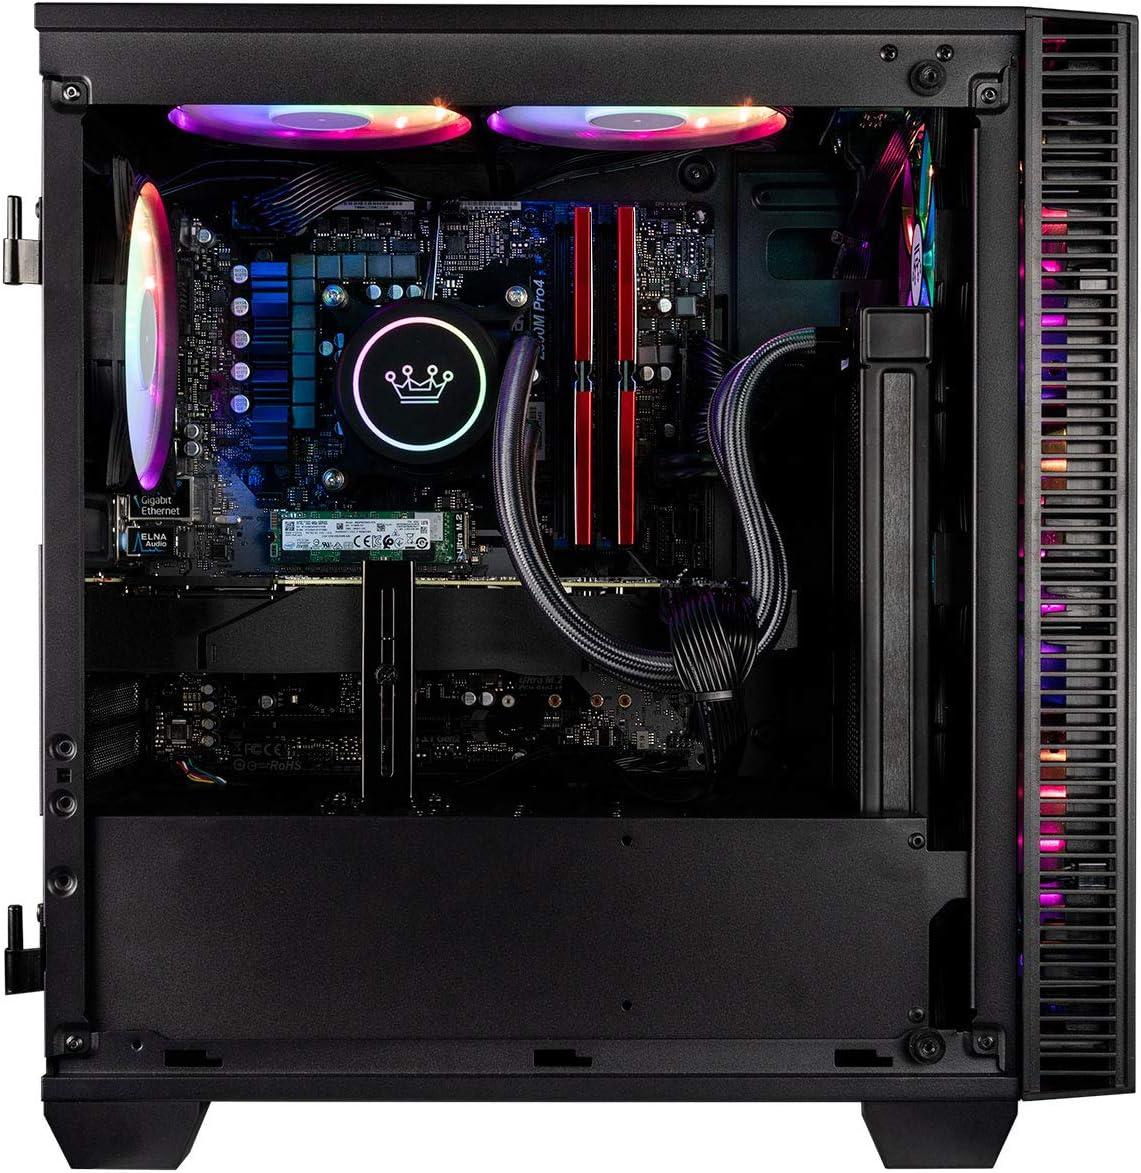 Gaming Desktop Computer CUK Continuum Micro Gamer PC Intel i7-9700F, 16GB RAM, 512GB NVMe SSD, NVIDIA GeForce GTX 1060 3GB, 600W Gold PSU, Windows 10 Home